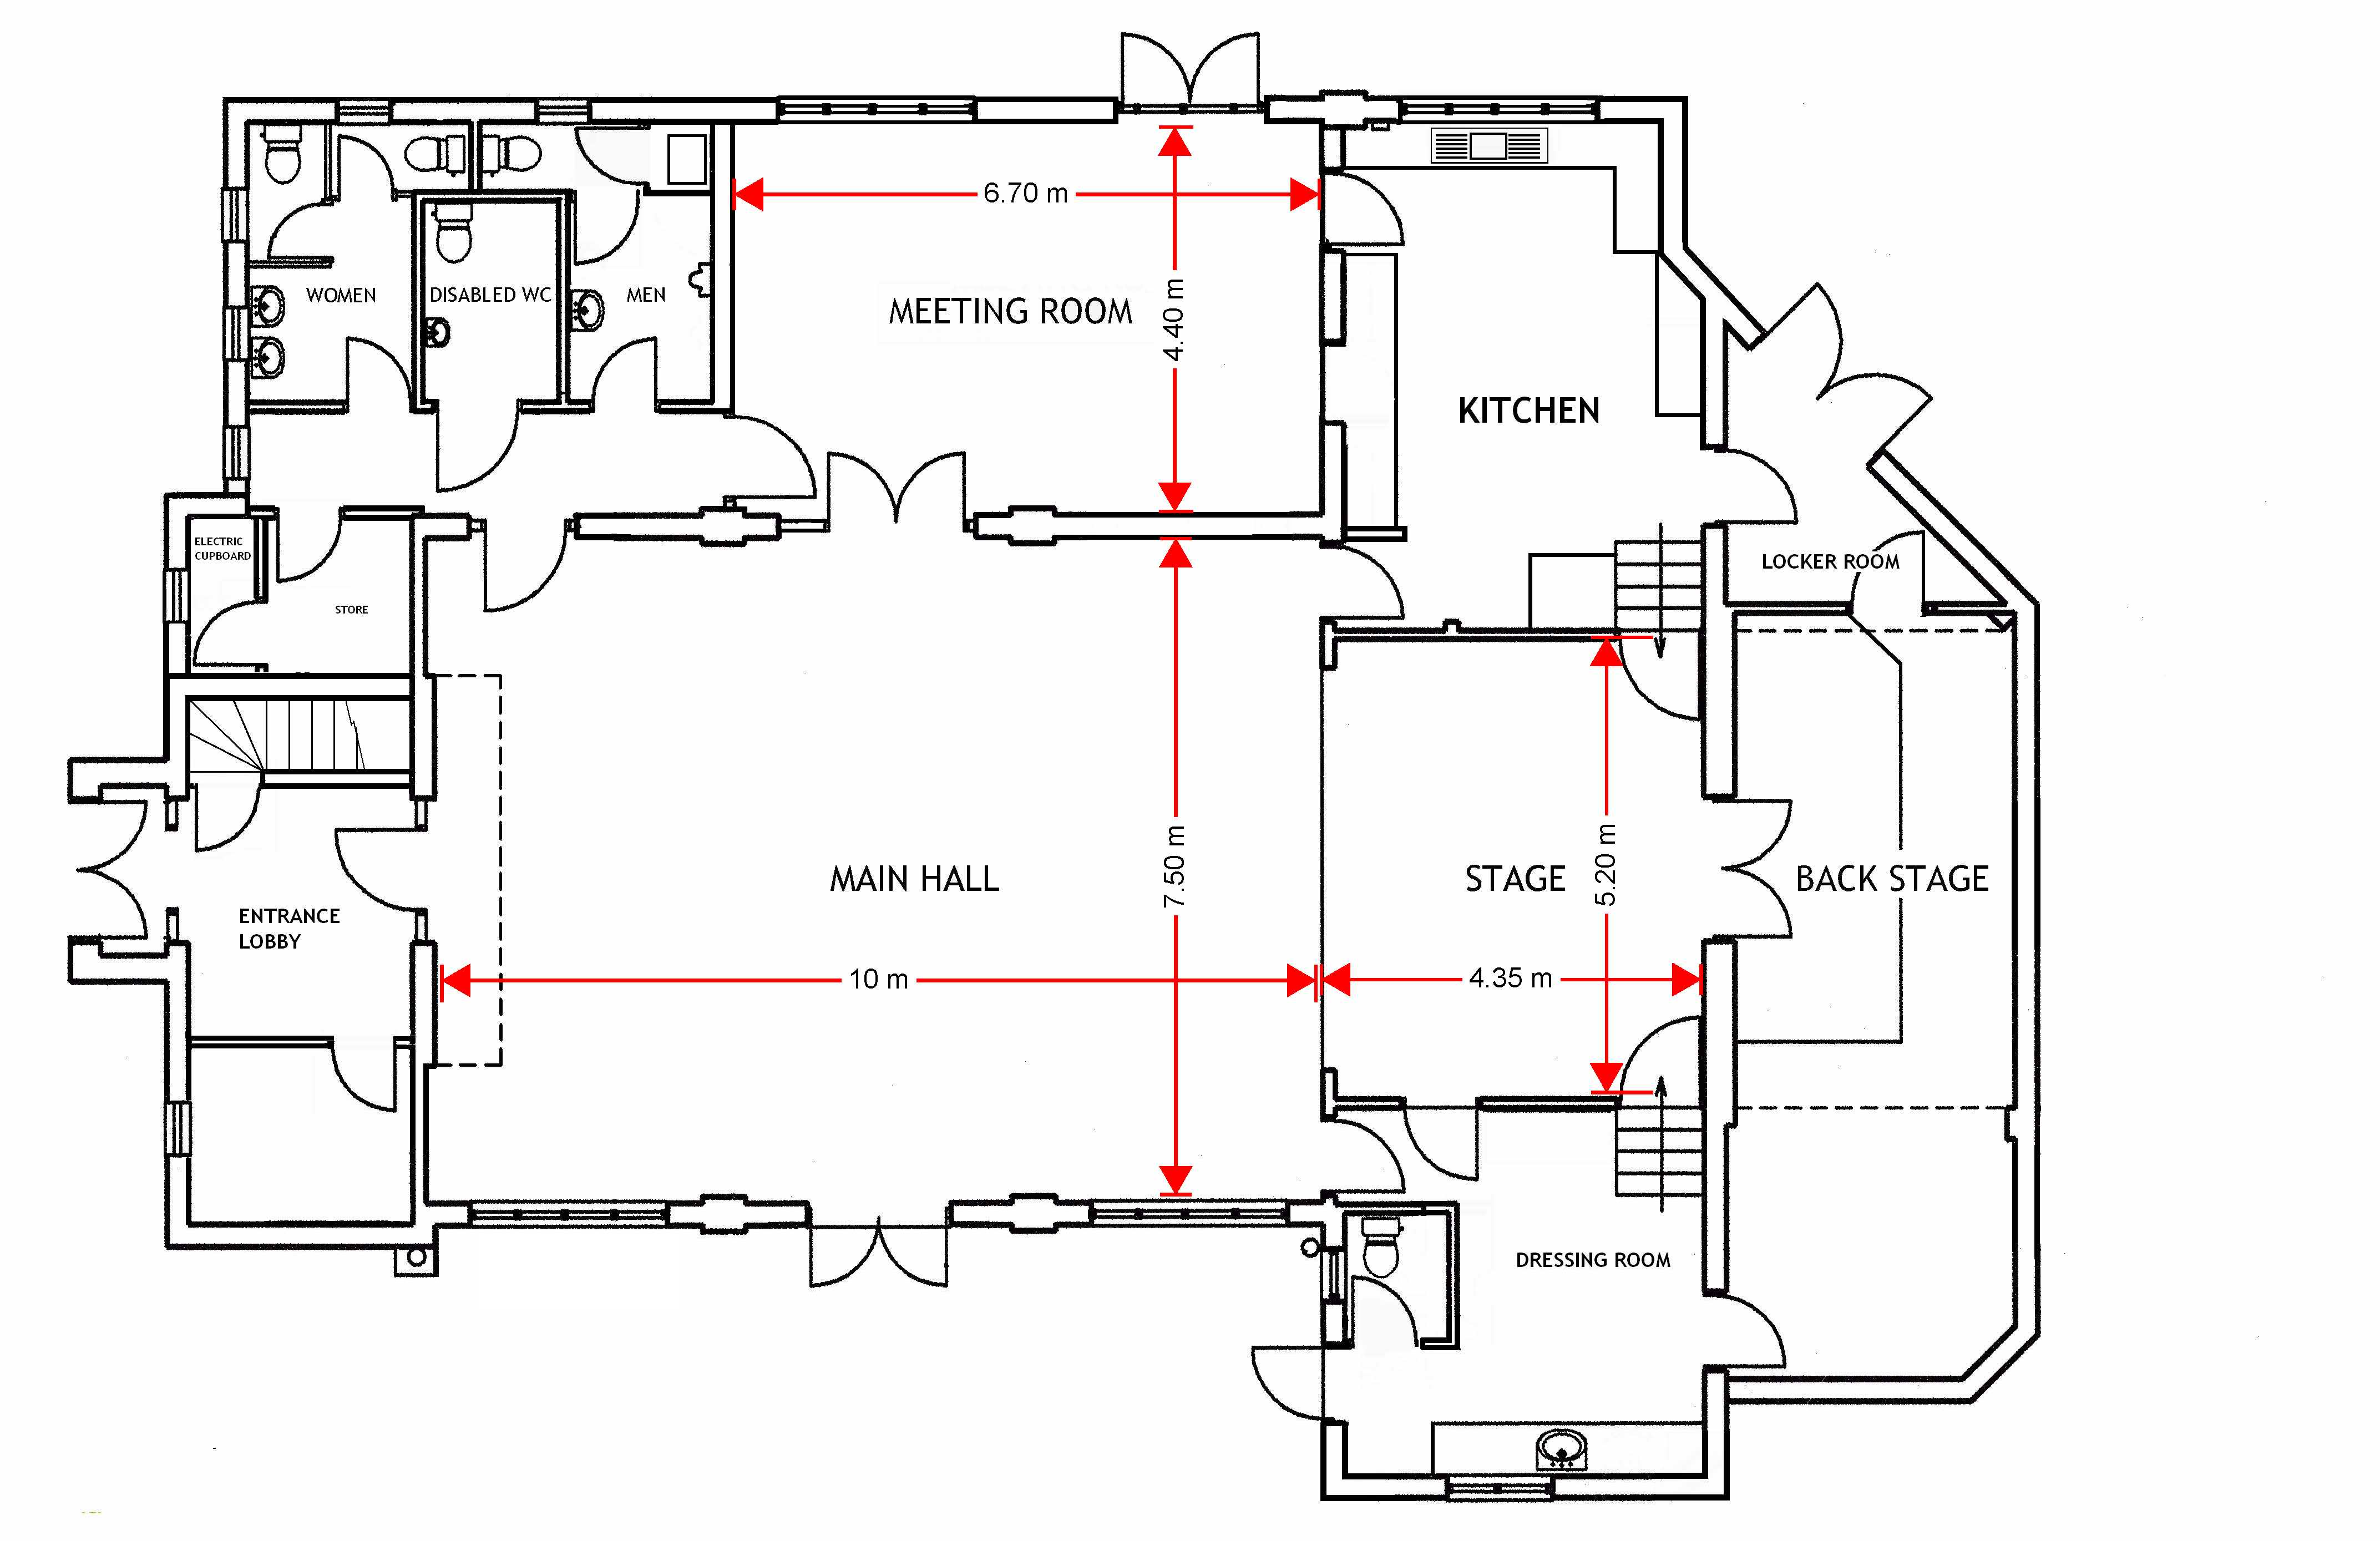 dimensioned ground floor plan ottershaw village hall dimensioned floor plans 1 a2 01 alisonkillion